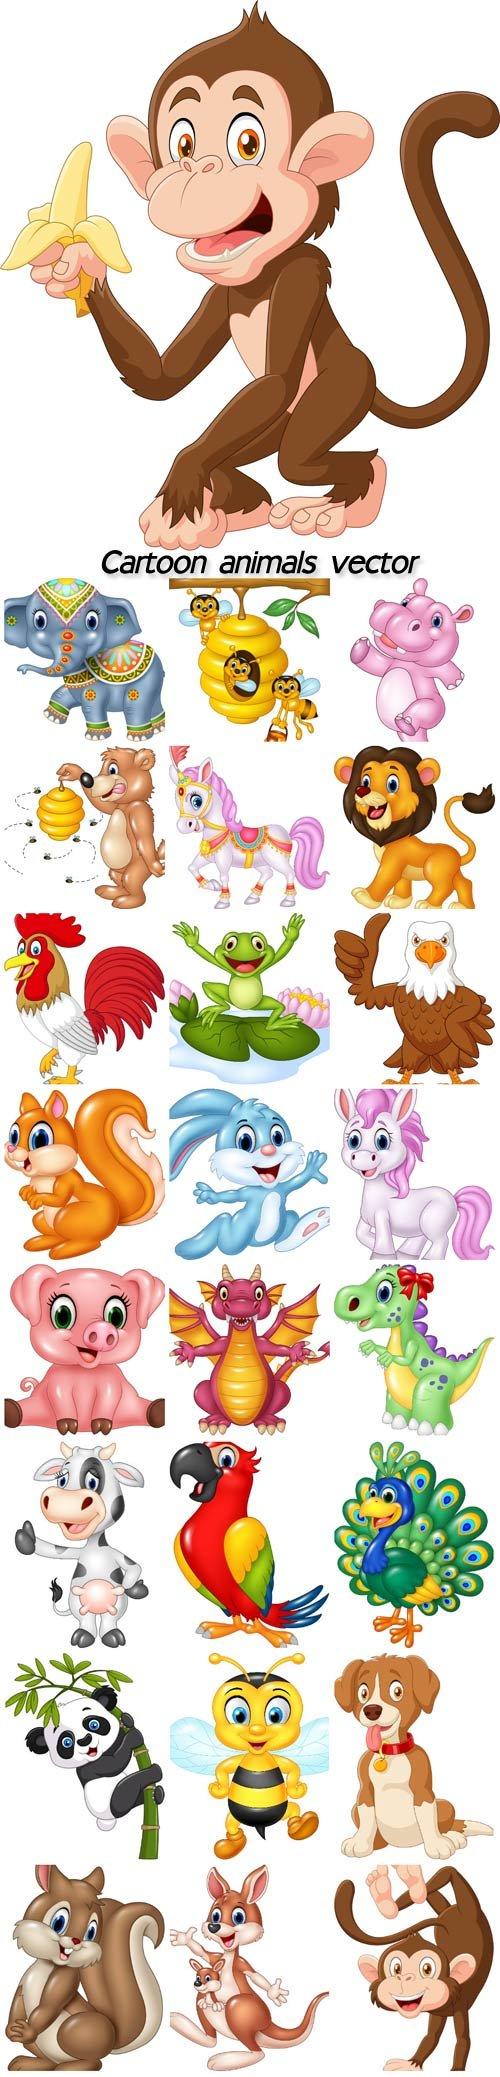 Cartoon animals vector, rabbit, squirrel, monkey